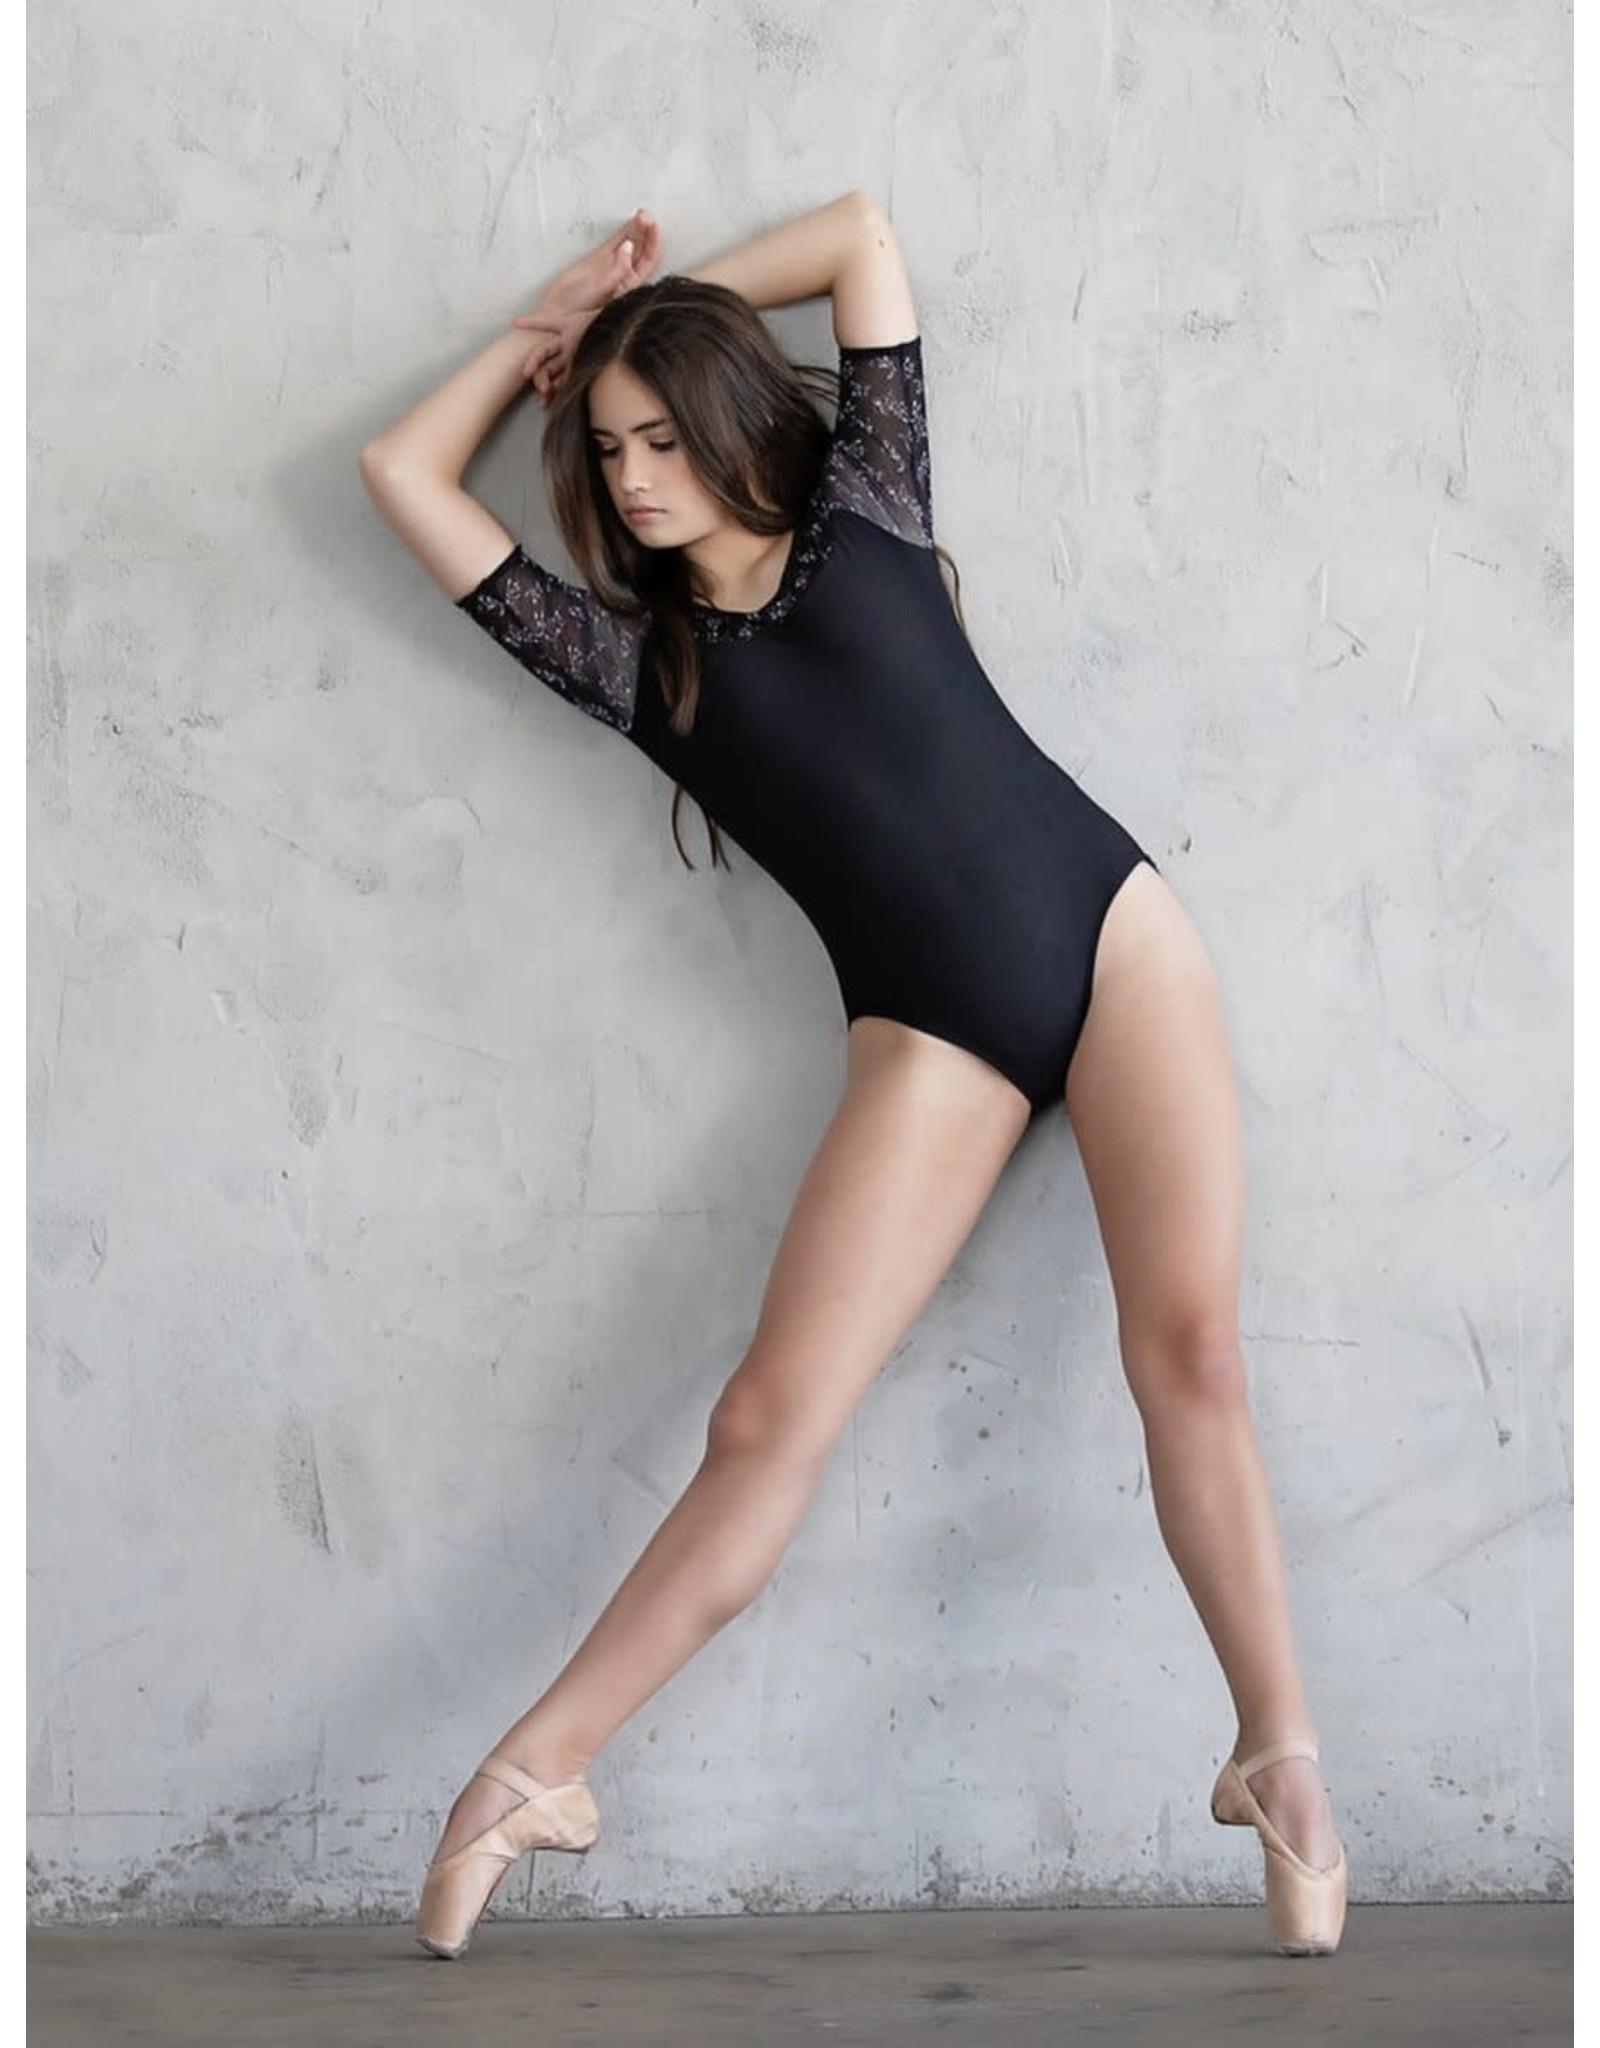 Chic Ballet THE OCTAVIA LEOTARD (CHIC115-BFL) - BLACK FLORAL